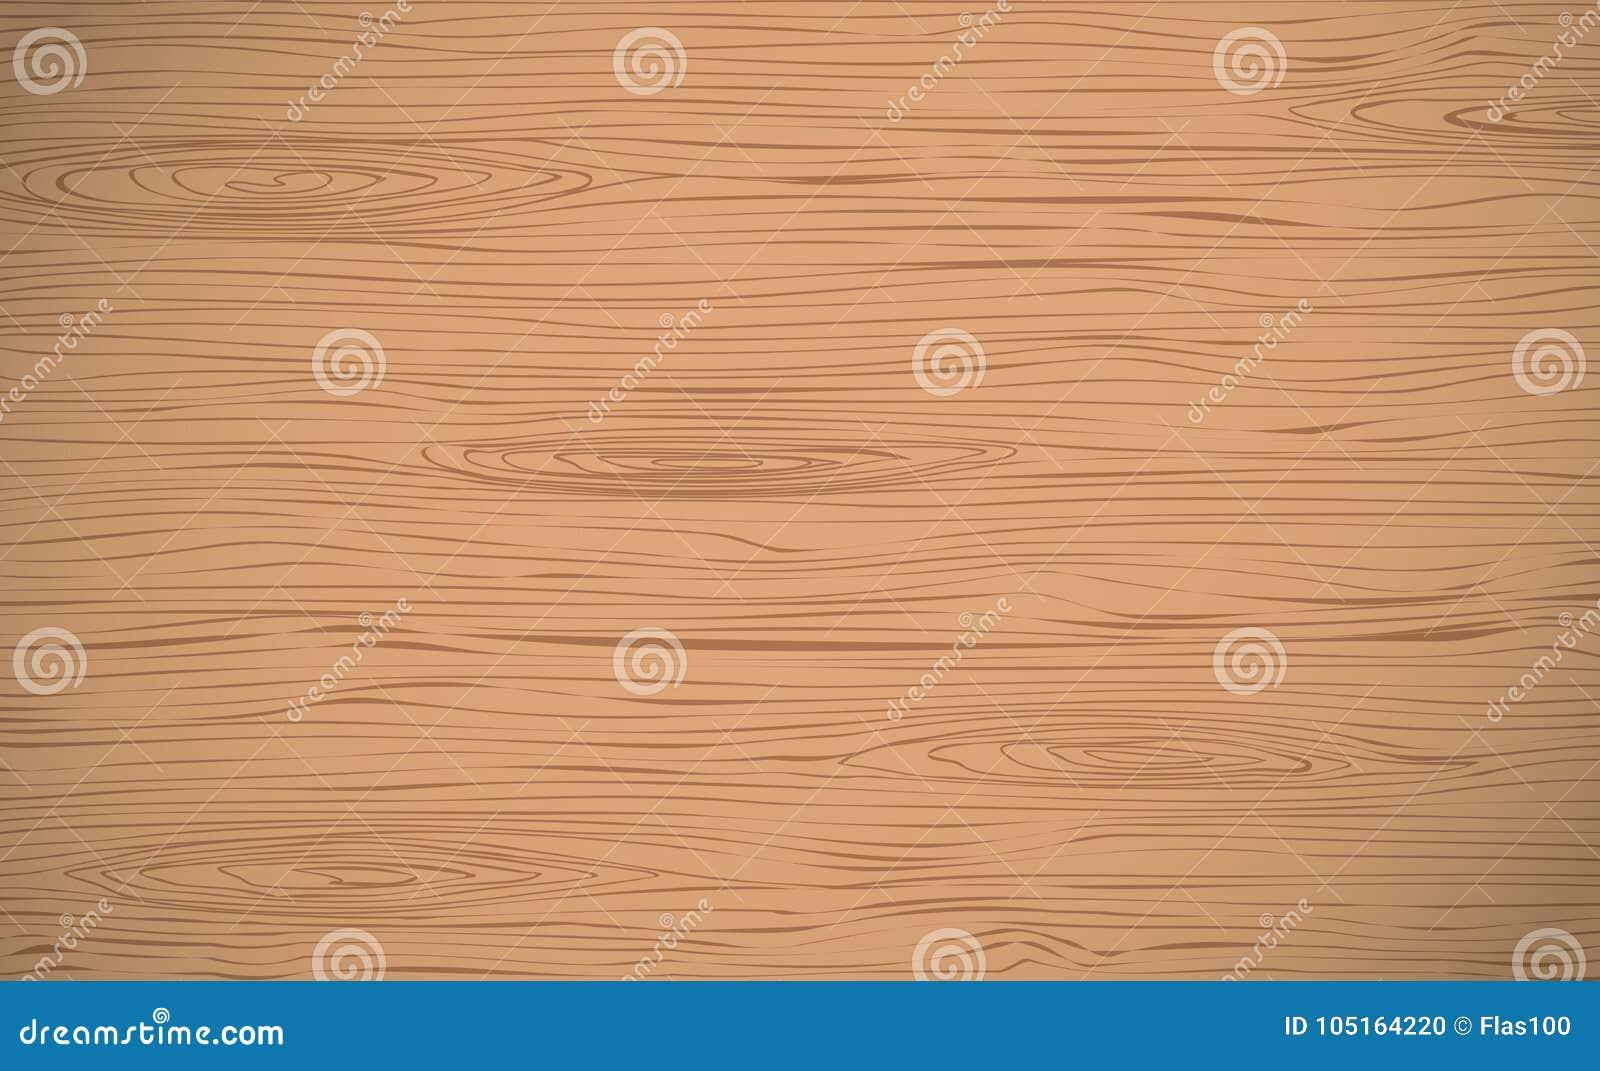 Hölzerner Fußbodenbelag ~ Hölzerner ausschnitt browns hackendes brett tabelle oder